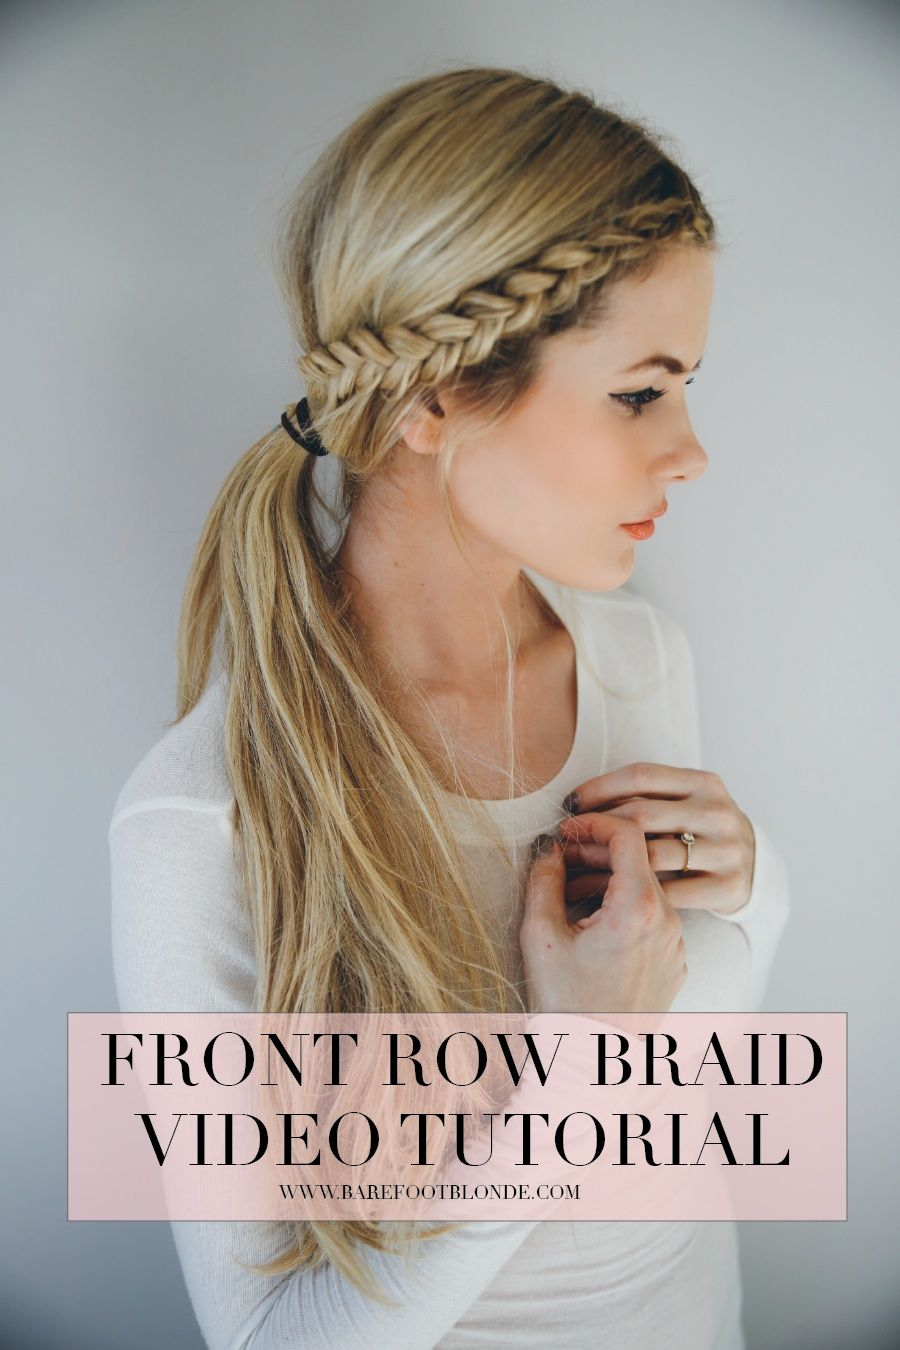 front row braid video tutorial | tutorials & tips | hair